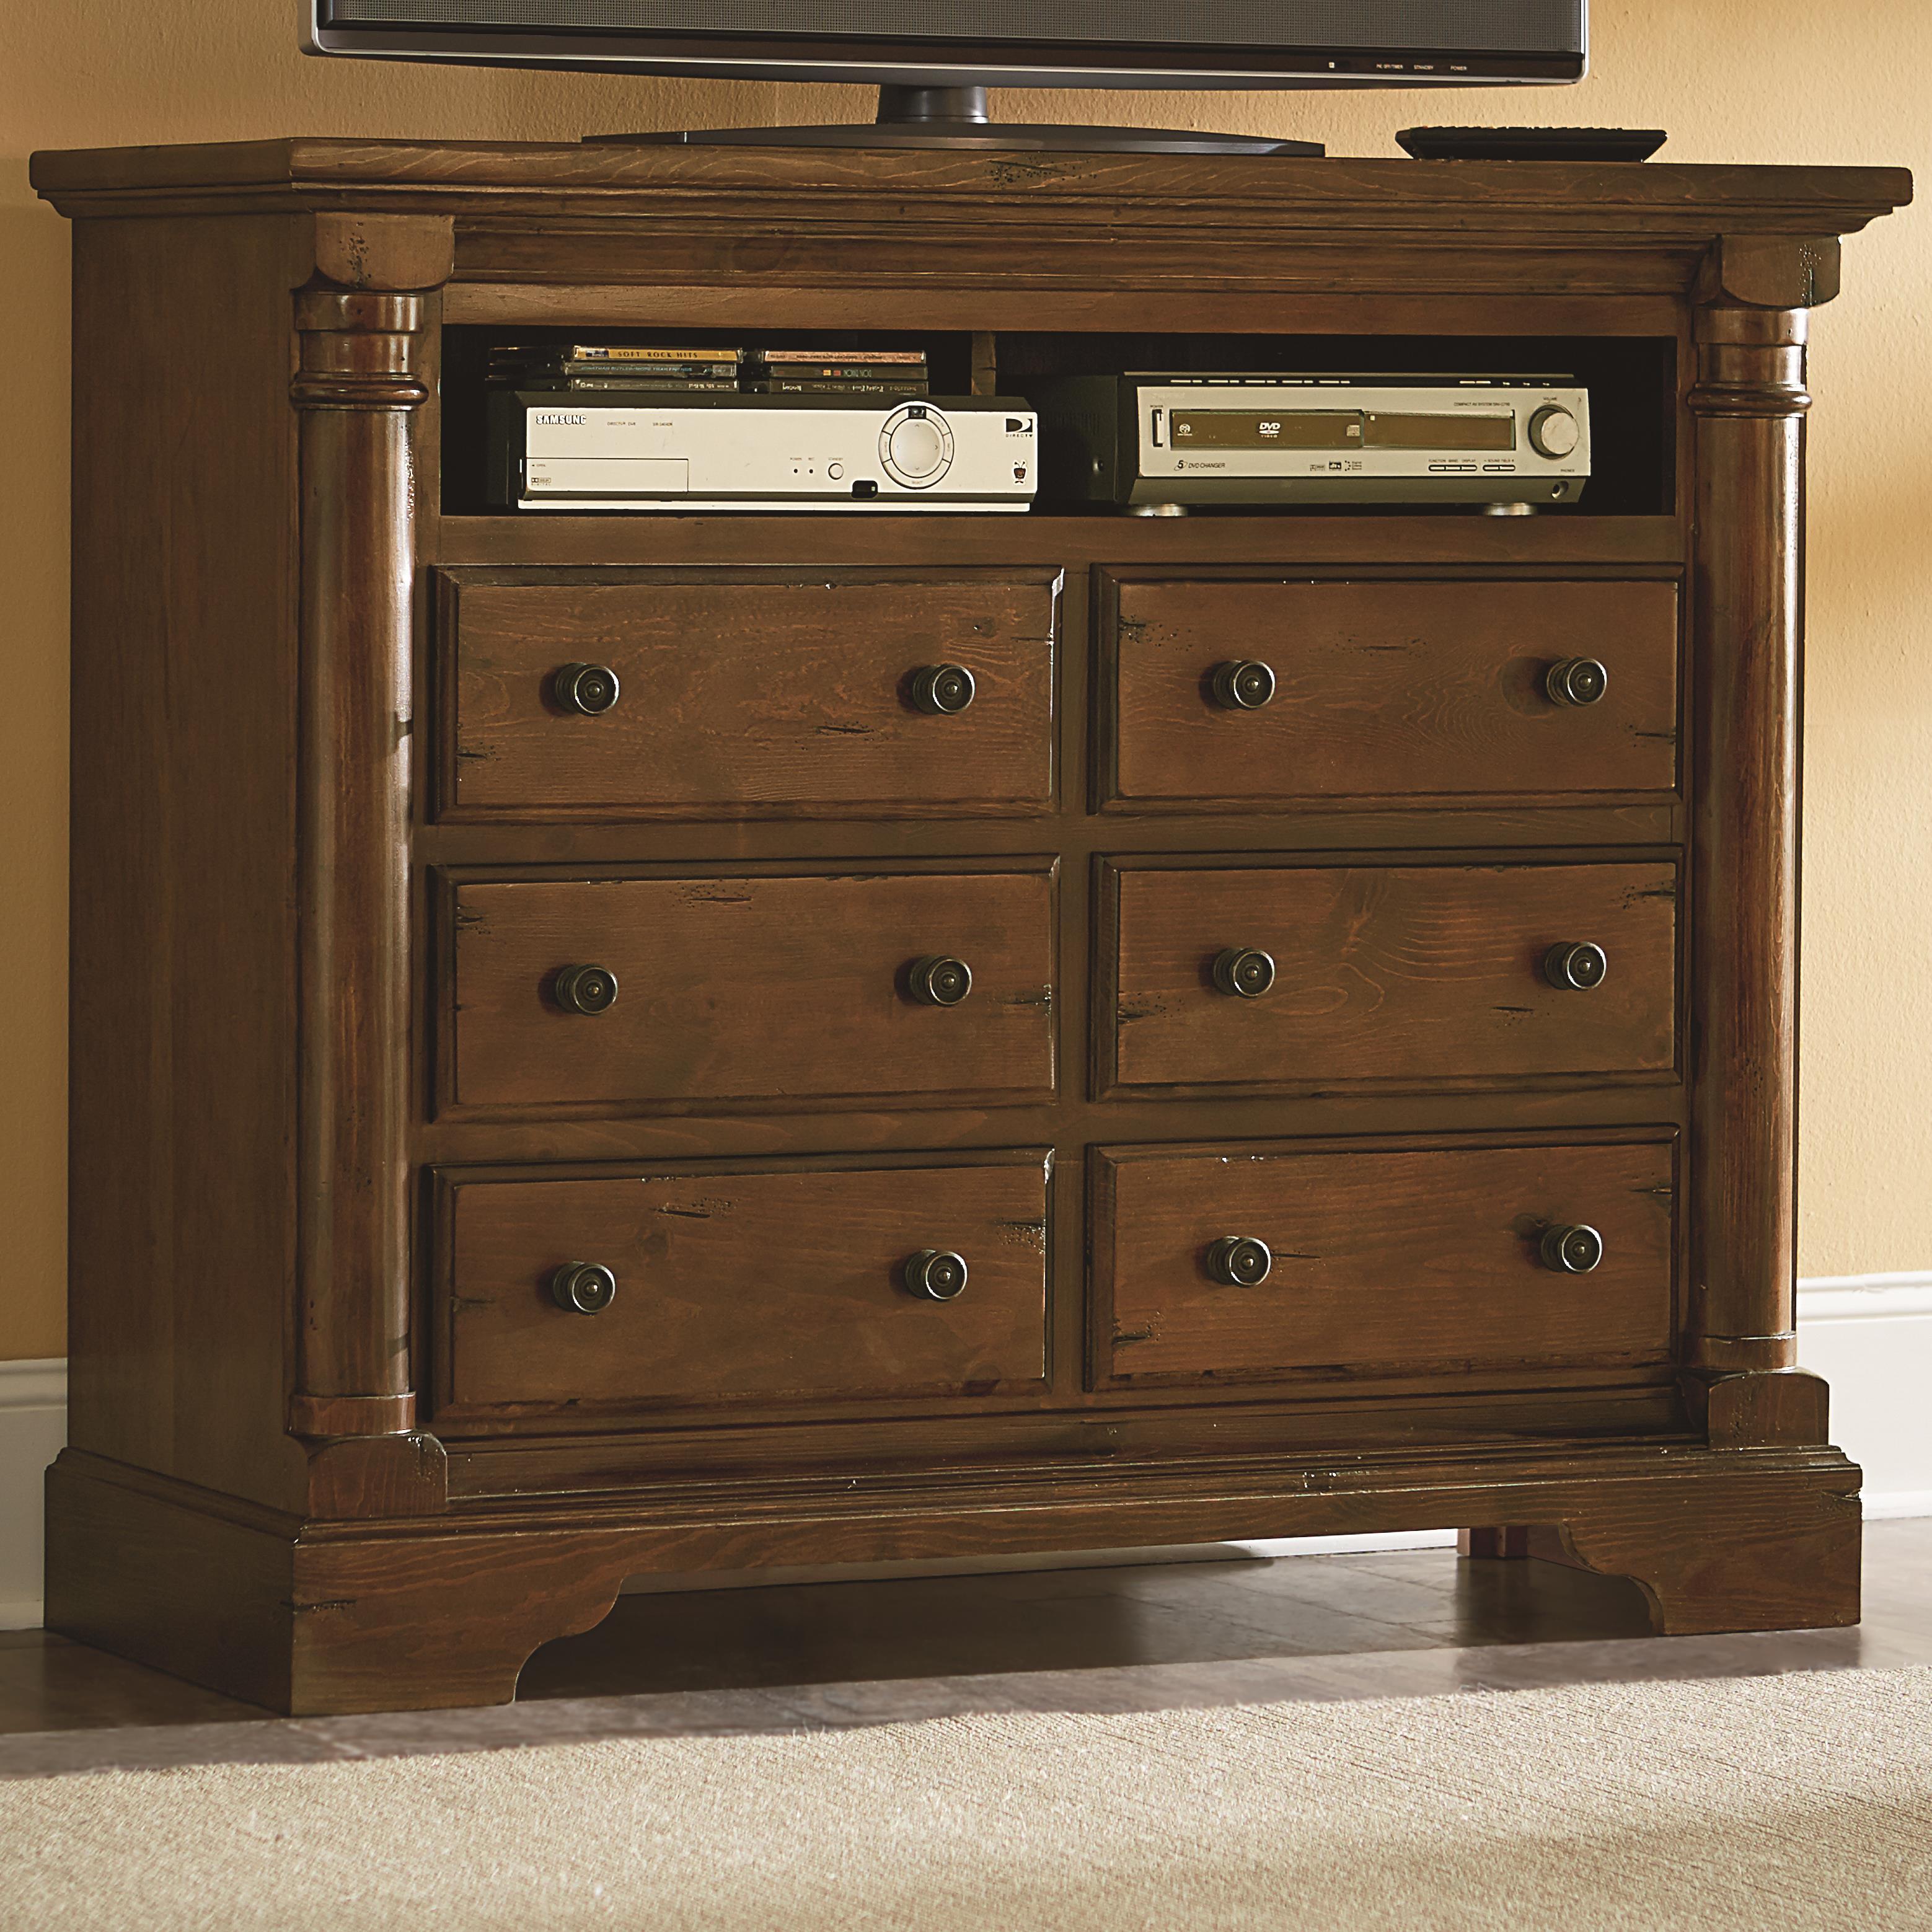 Progressive Furniture Gramercy Park Media Chest - Item Number: P660-46